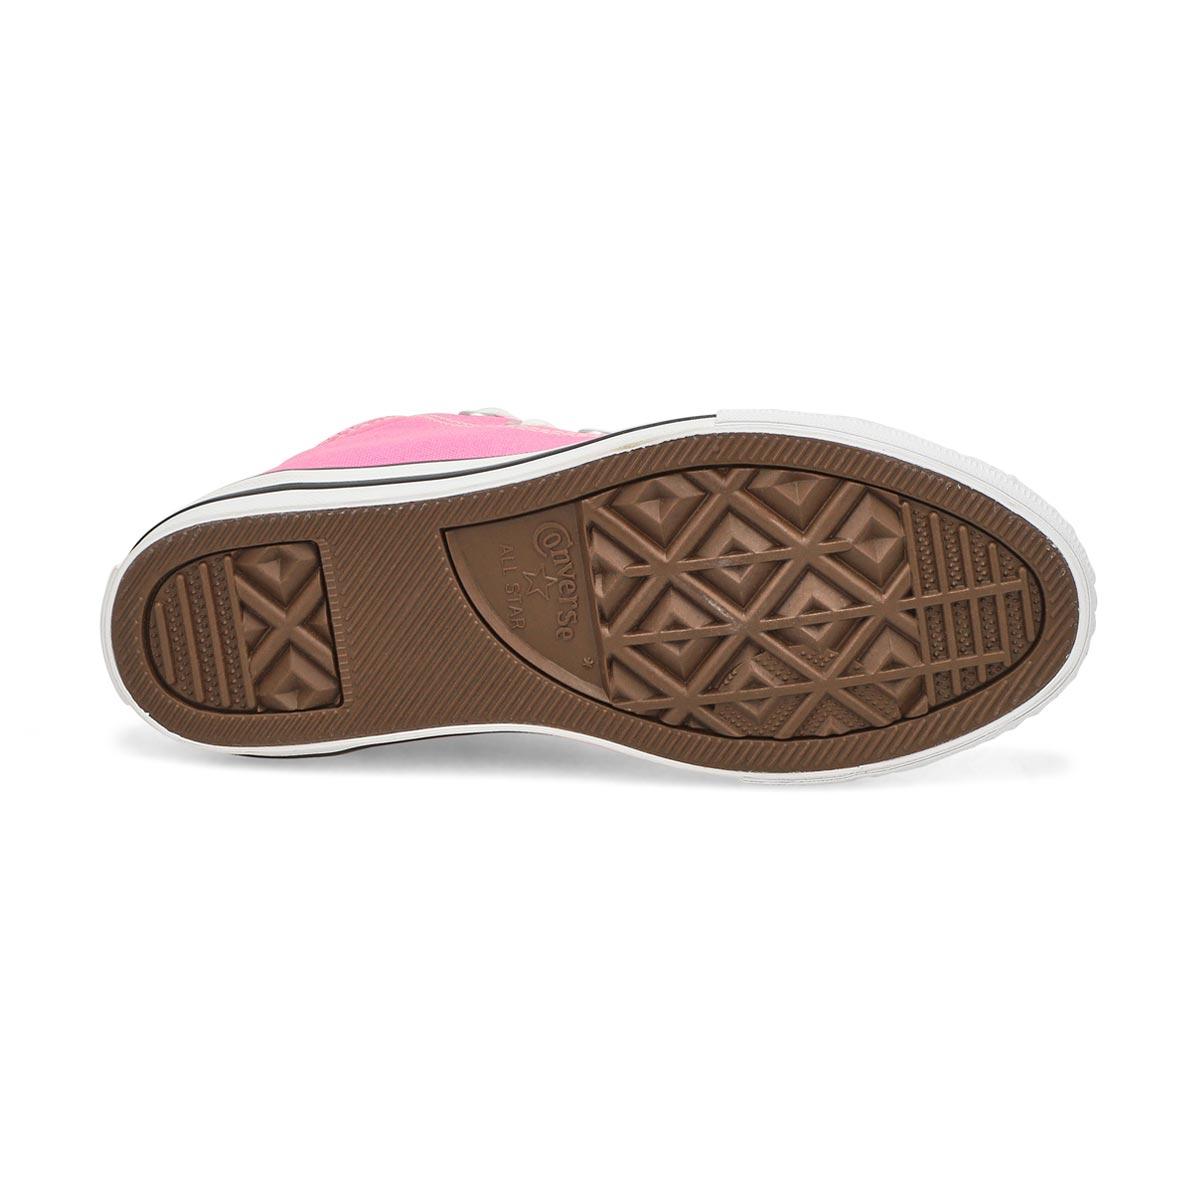 Girls' Chuck Taylor All Star Sneaker - Pink